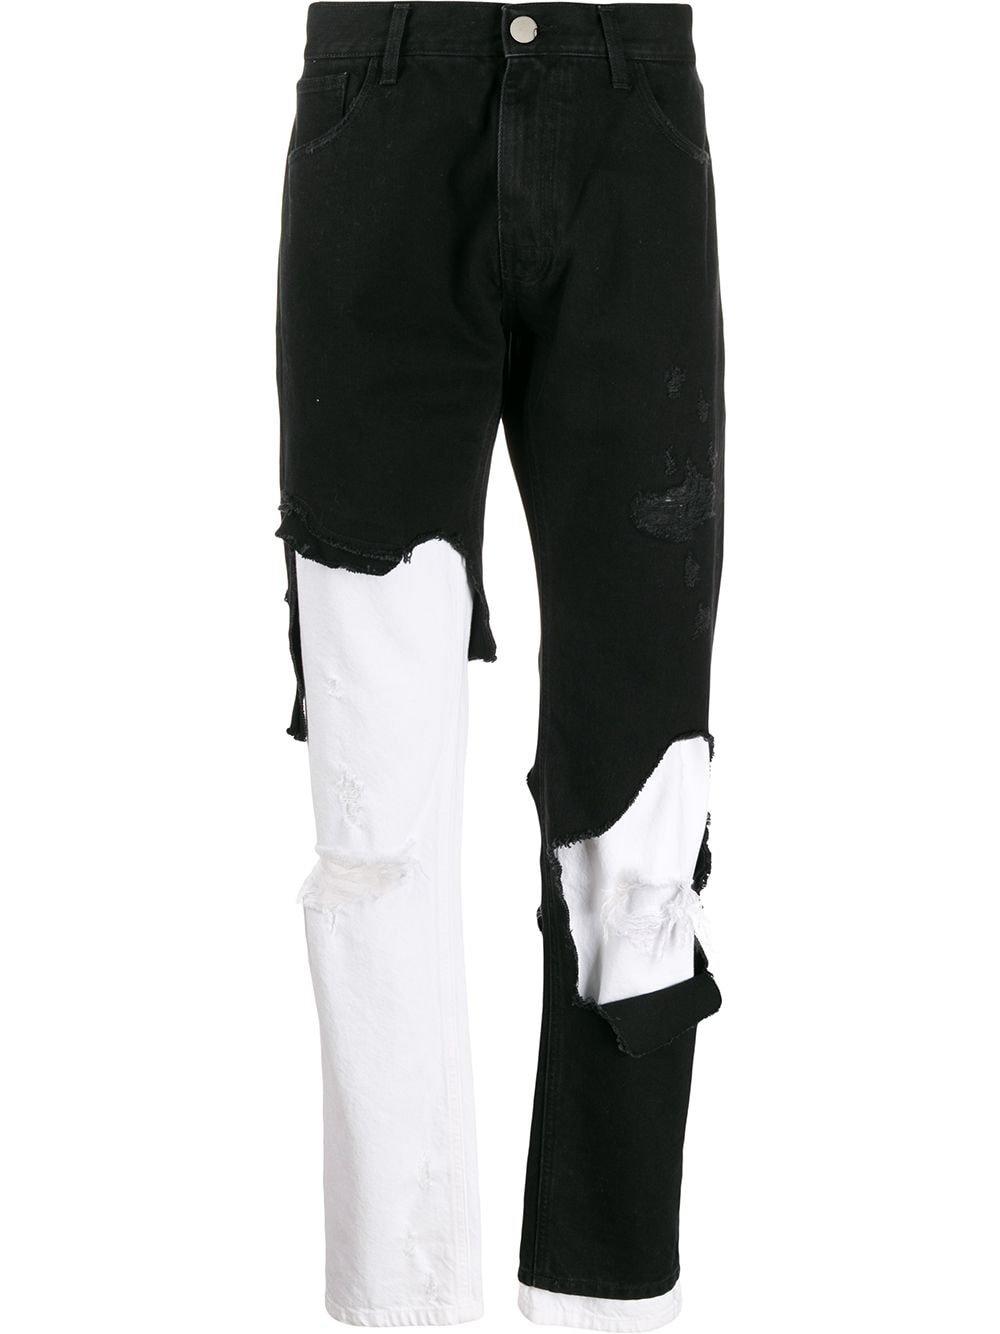 Raf Simons Destroyed Slim Fit Jeans   Farfetch.com